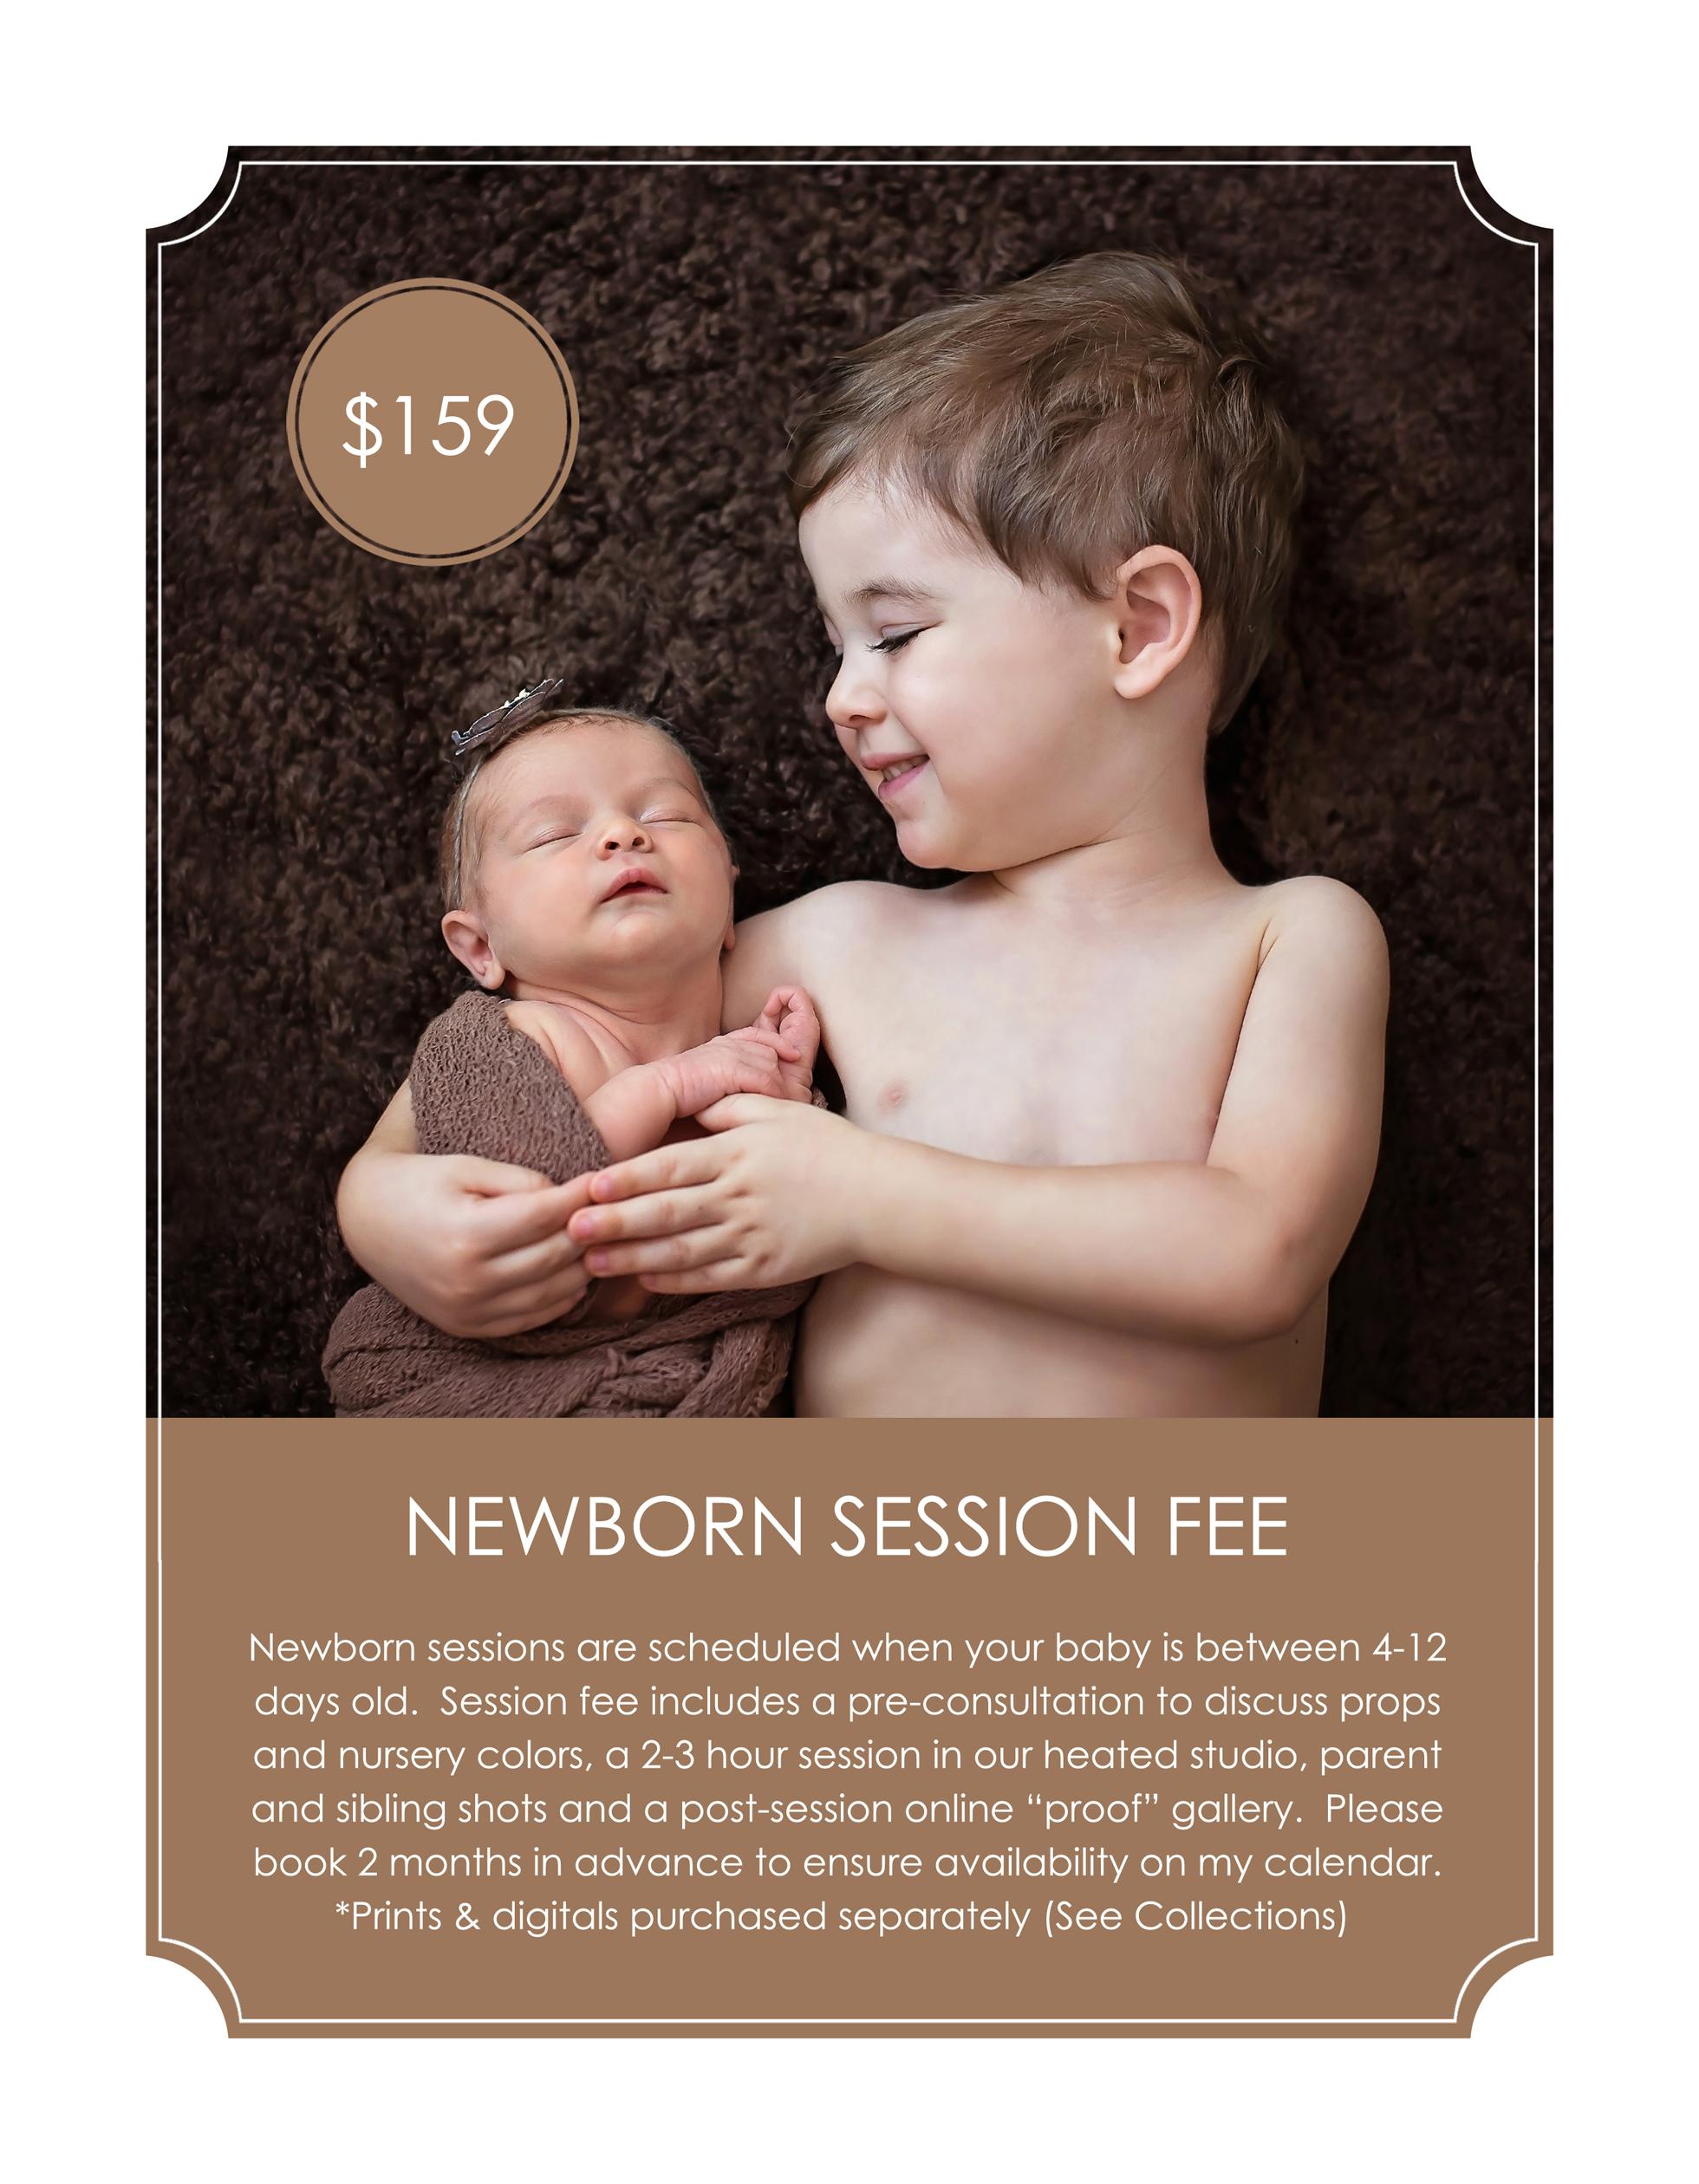 Newborn session pricing